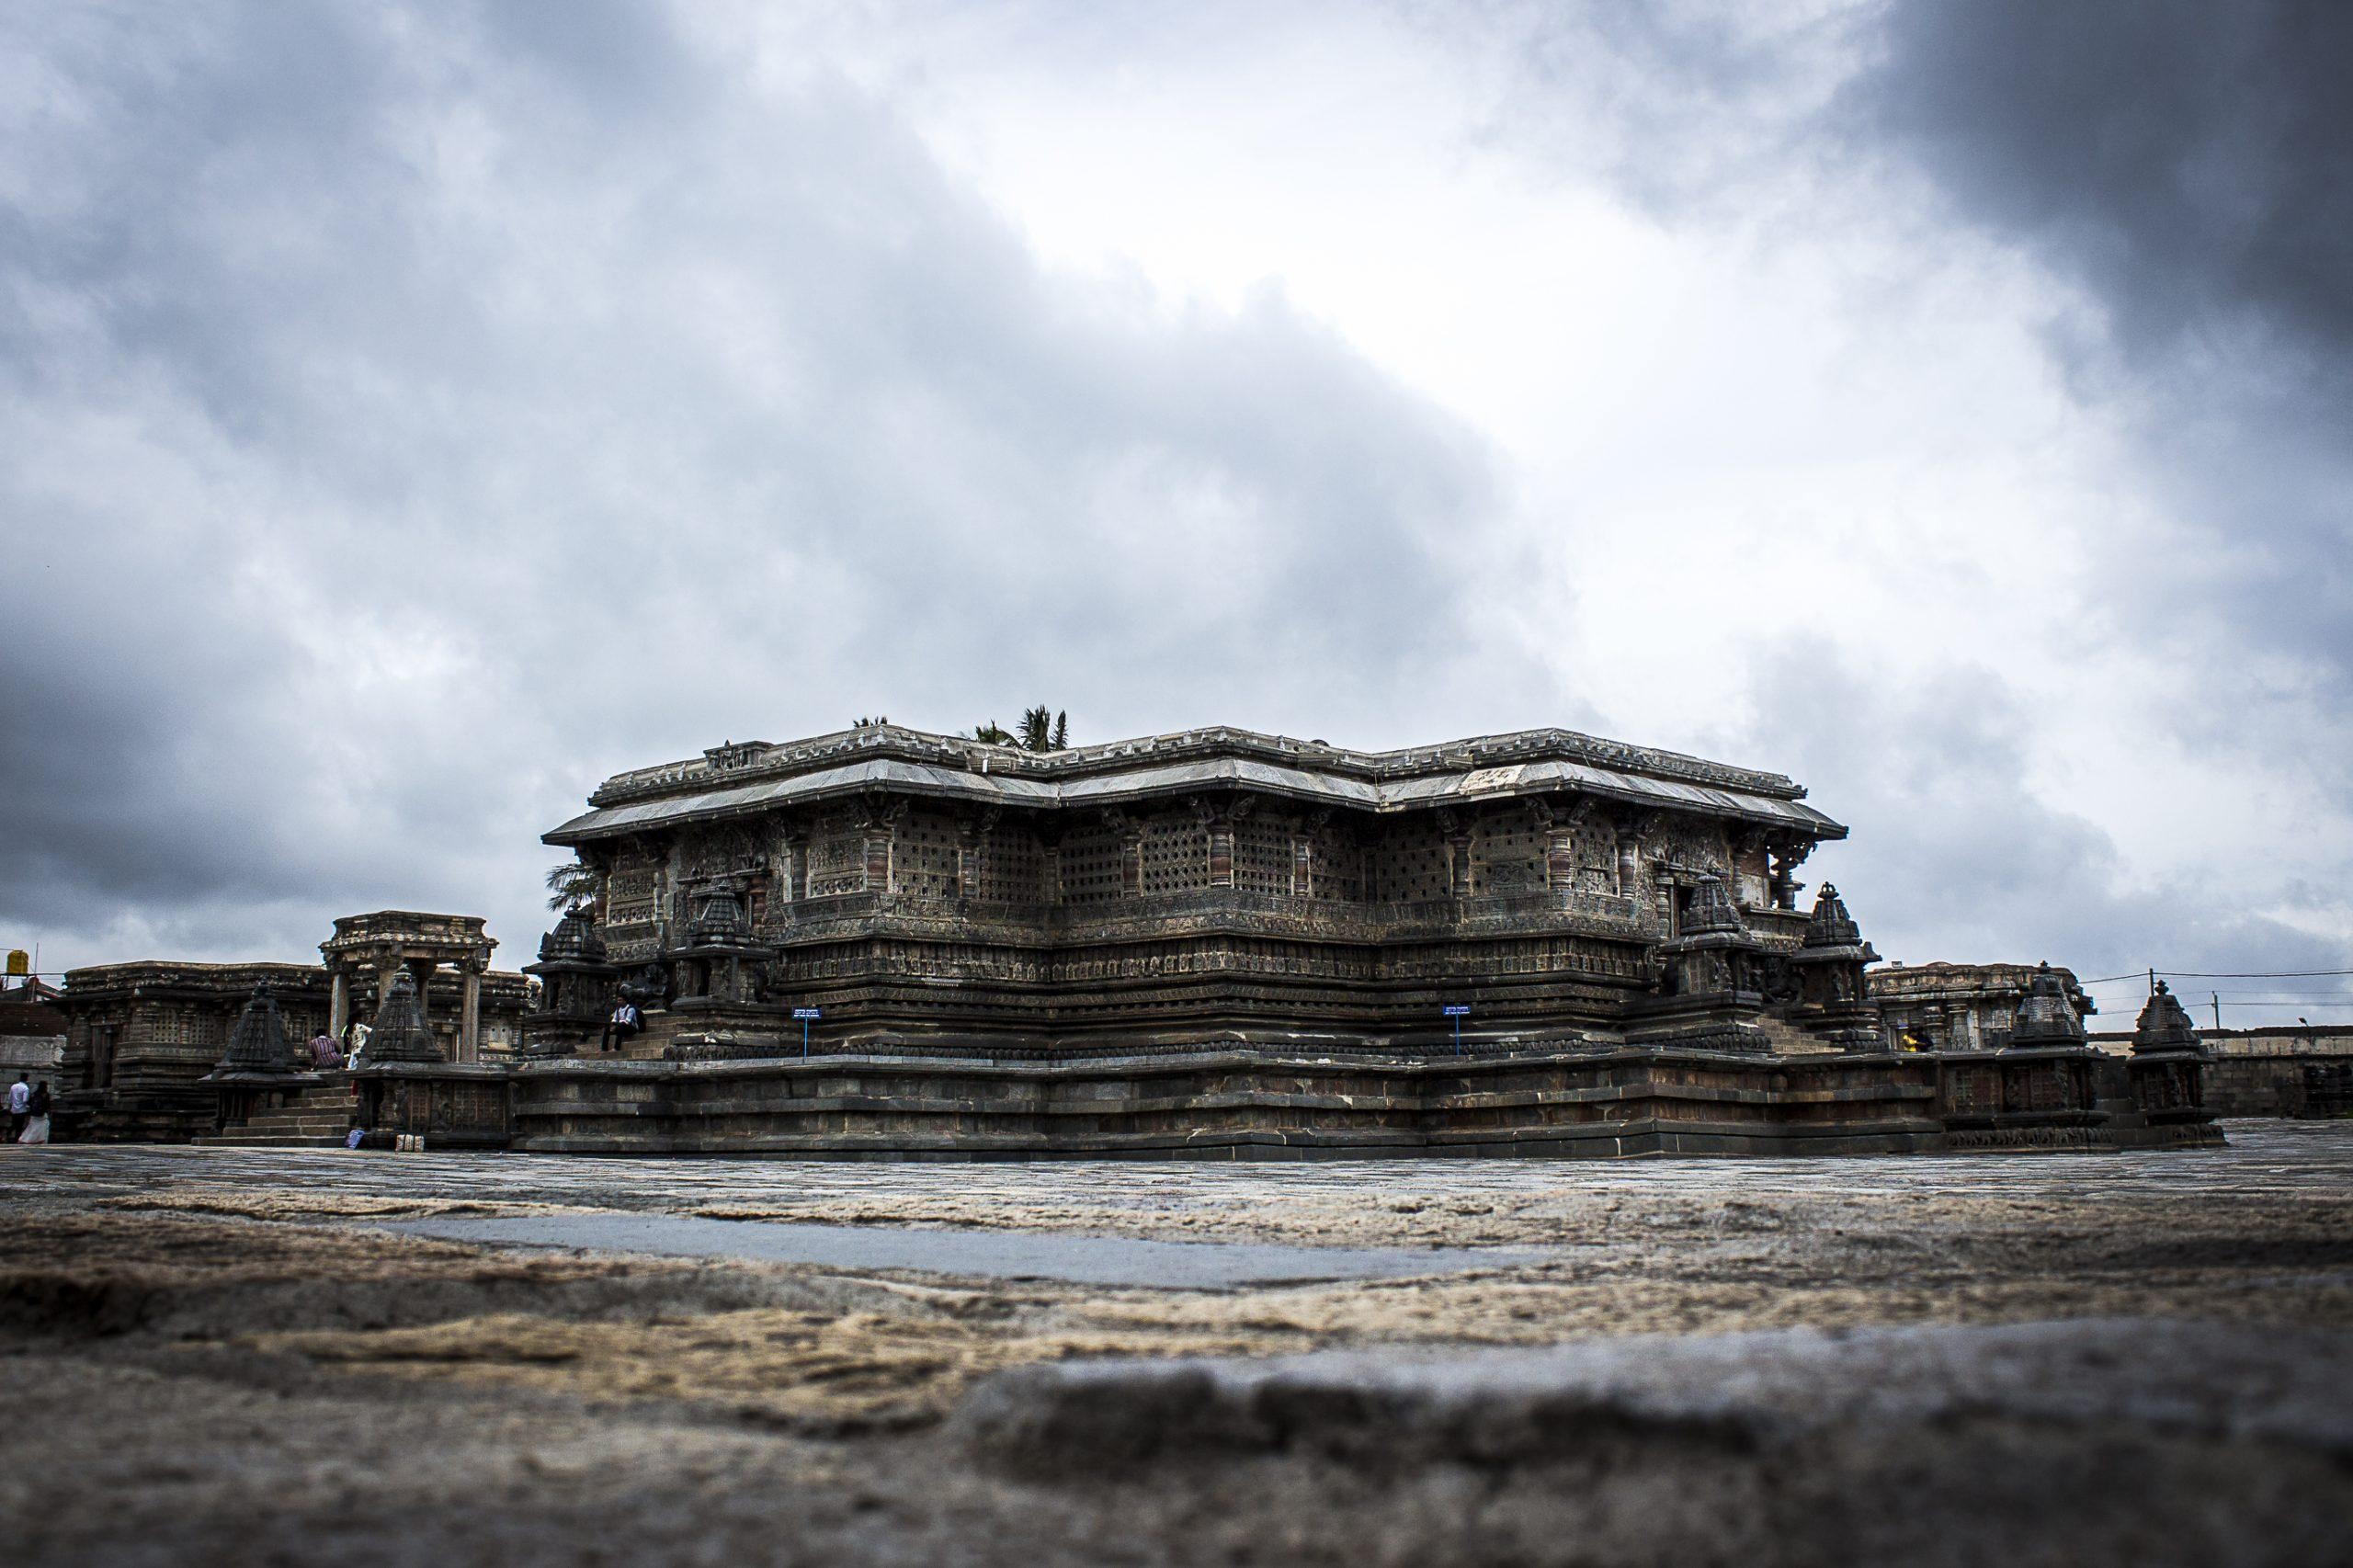 Channakeshava Temple in Beluru